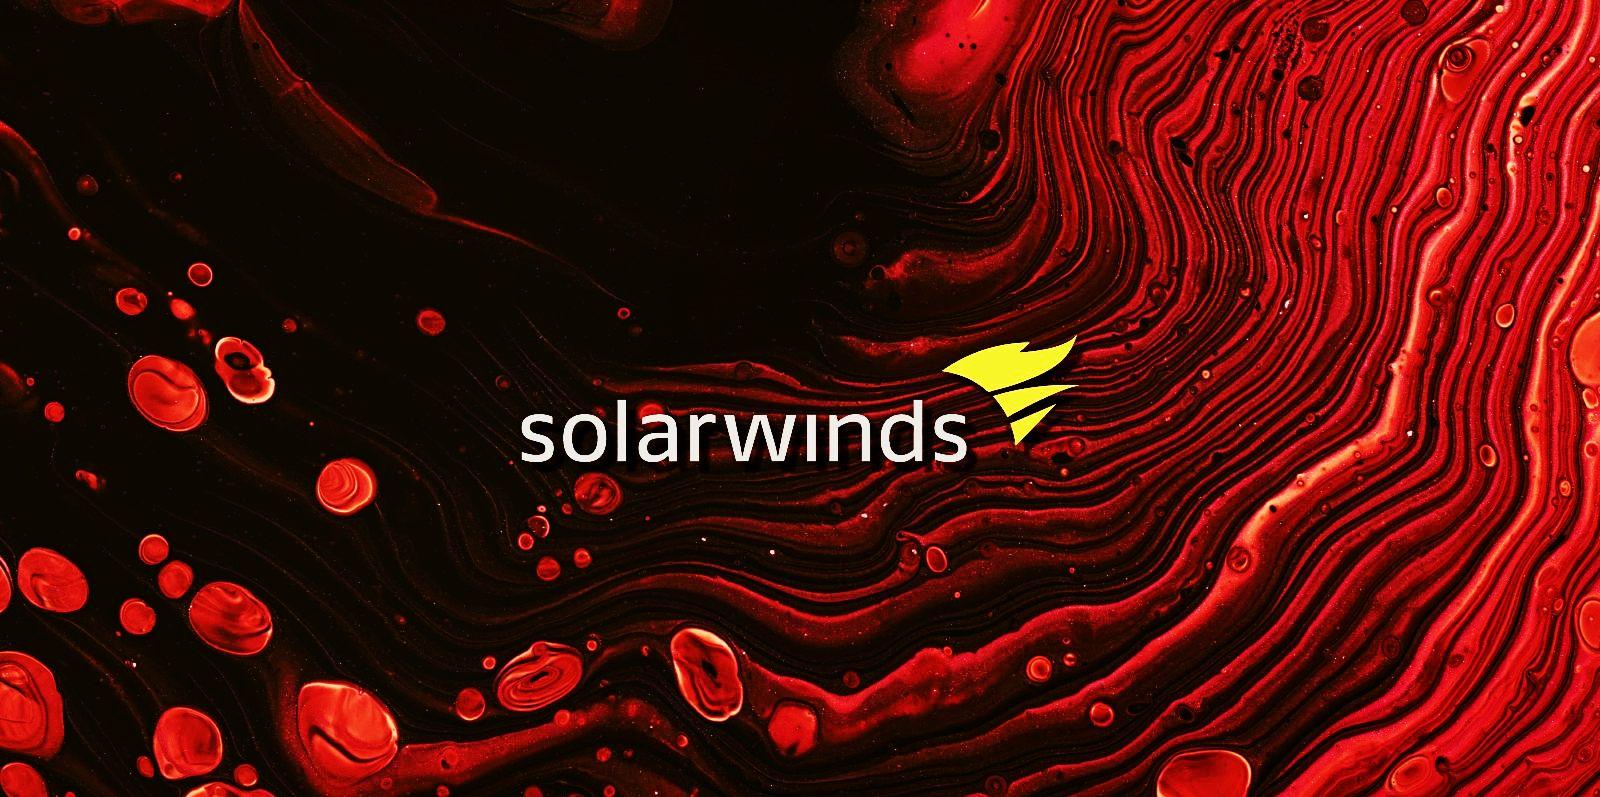 SolarWinds patches critical Serv-U vulnerability exploited in the wild